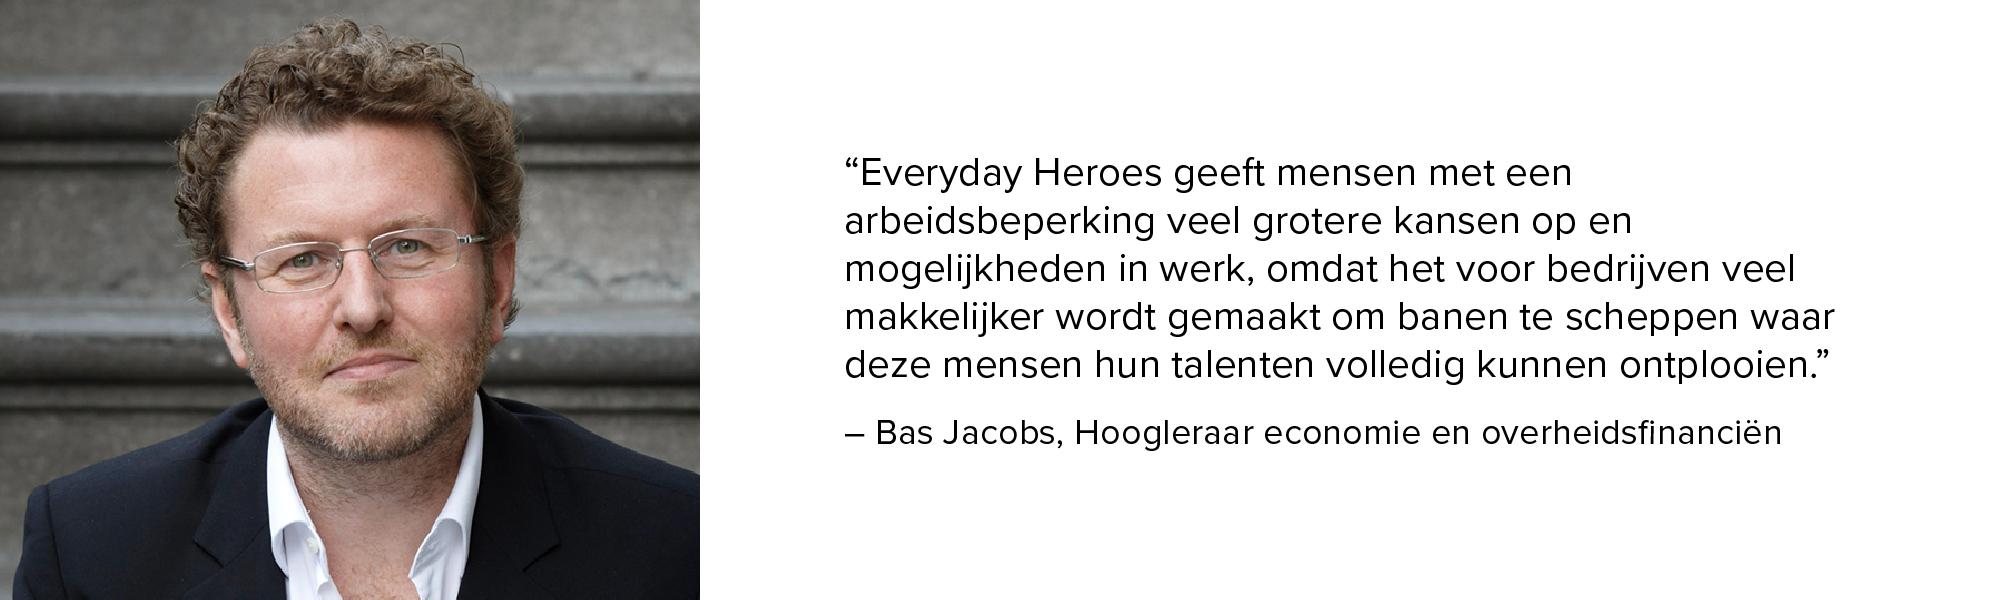 Bas Jacobs@2x-100.jpg